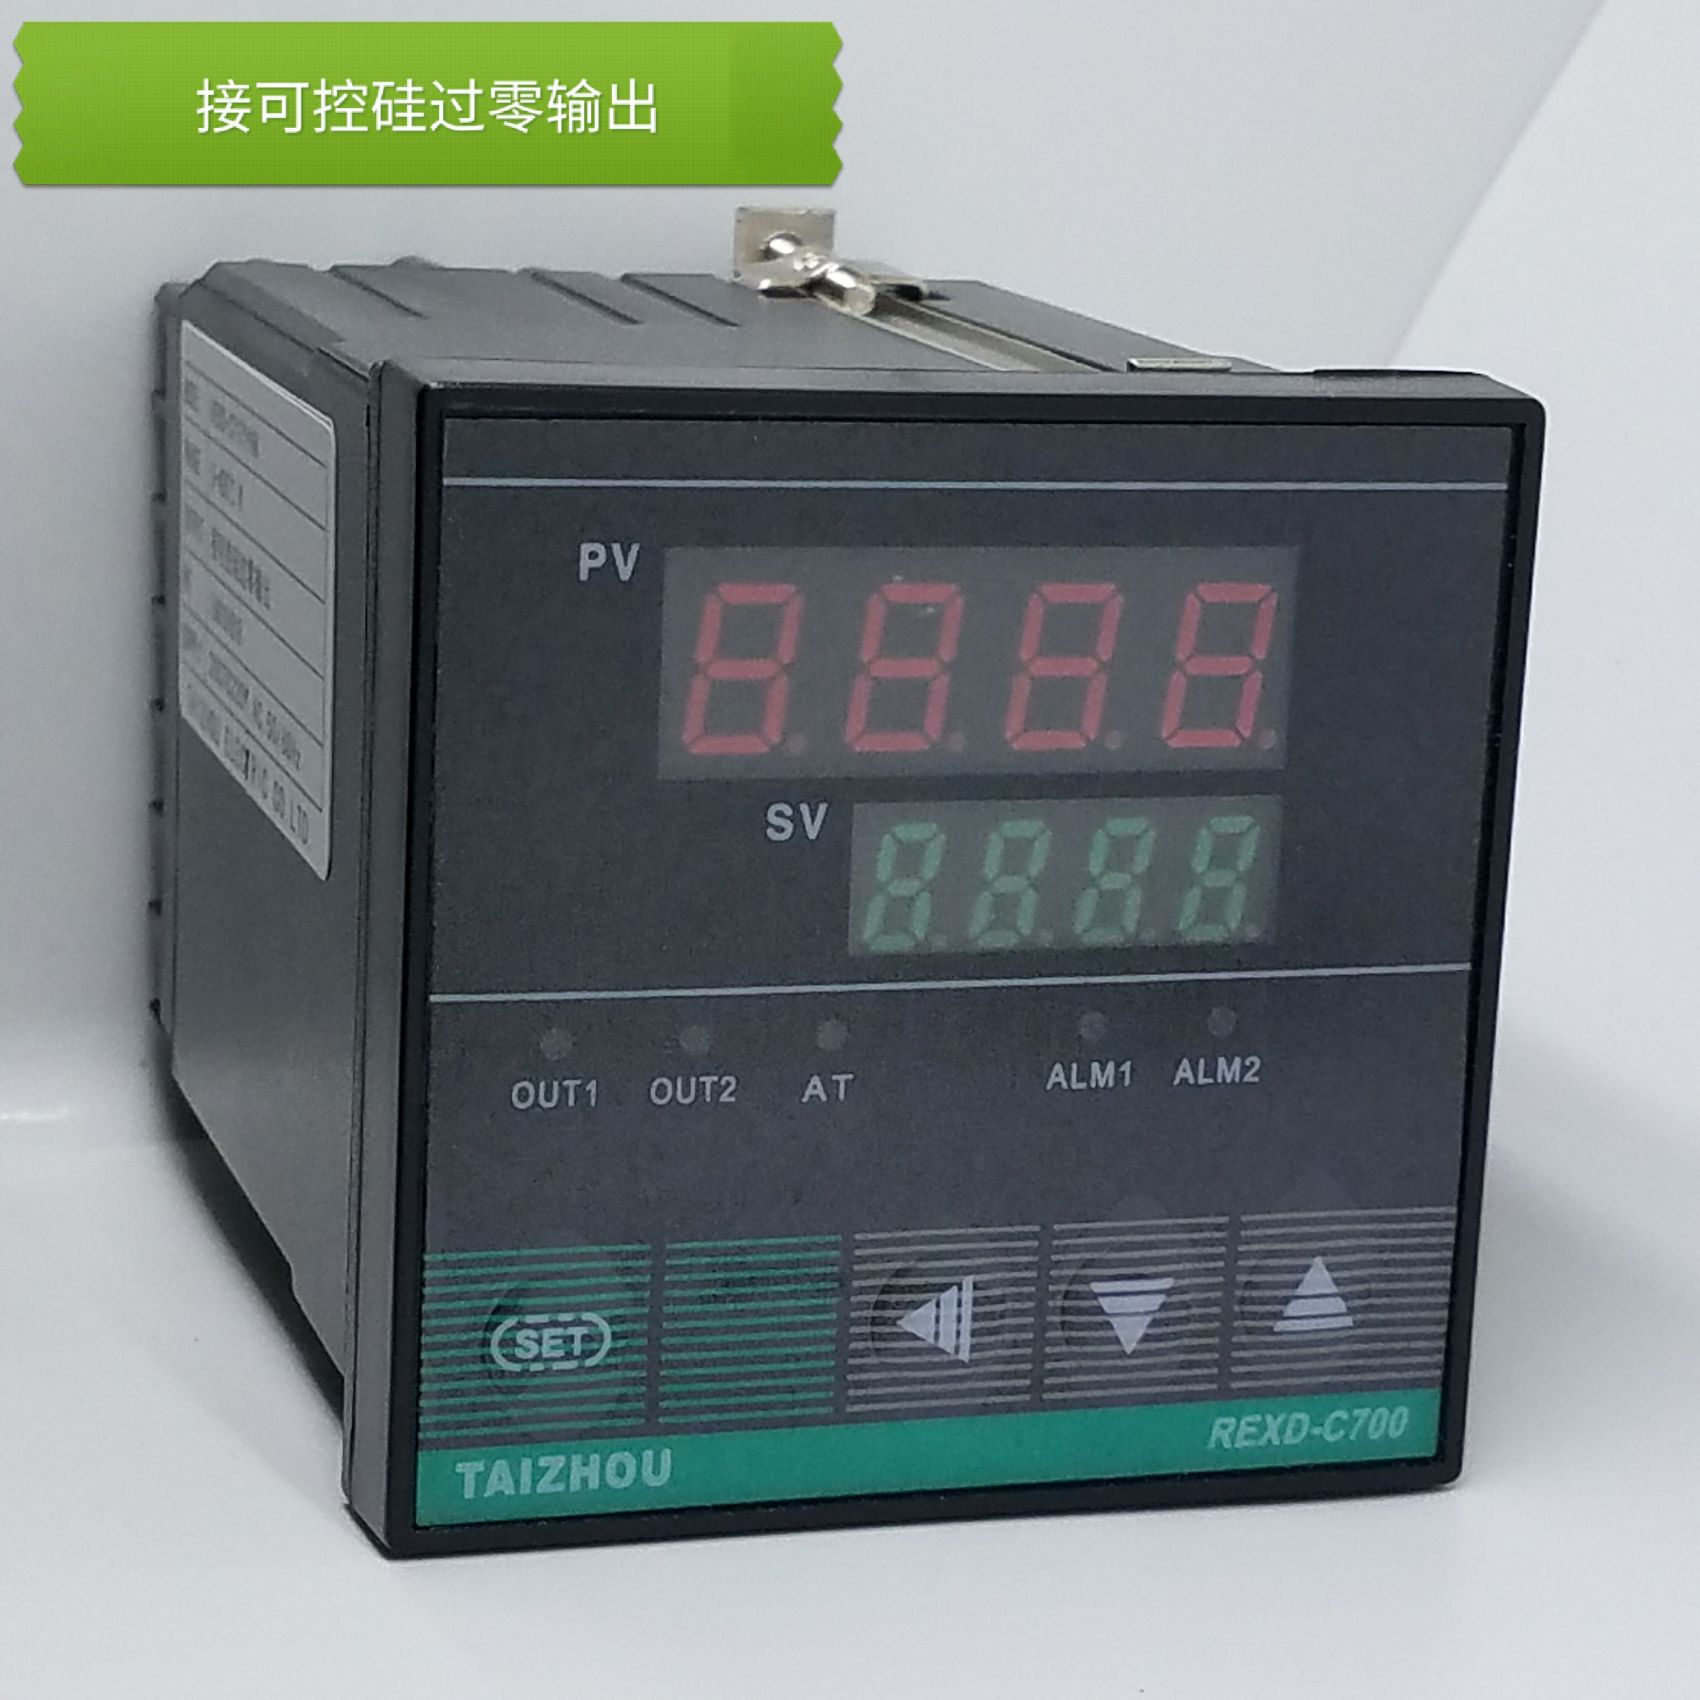 TAIZHOU Electrical  Appliance Instrument REXD-C7191 K 0-400 399 600 800 REXD-C700 Series Temperature Controller relay  Oven-5pcs